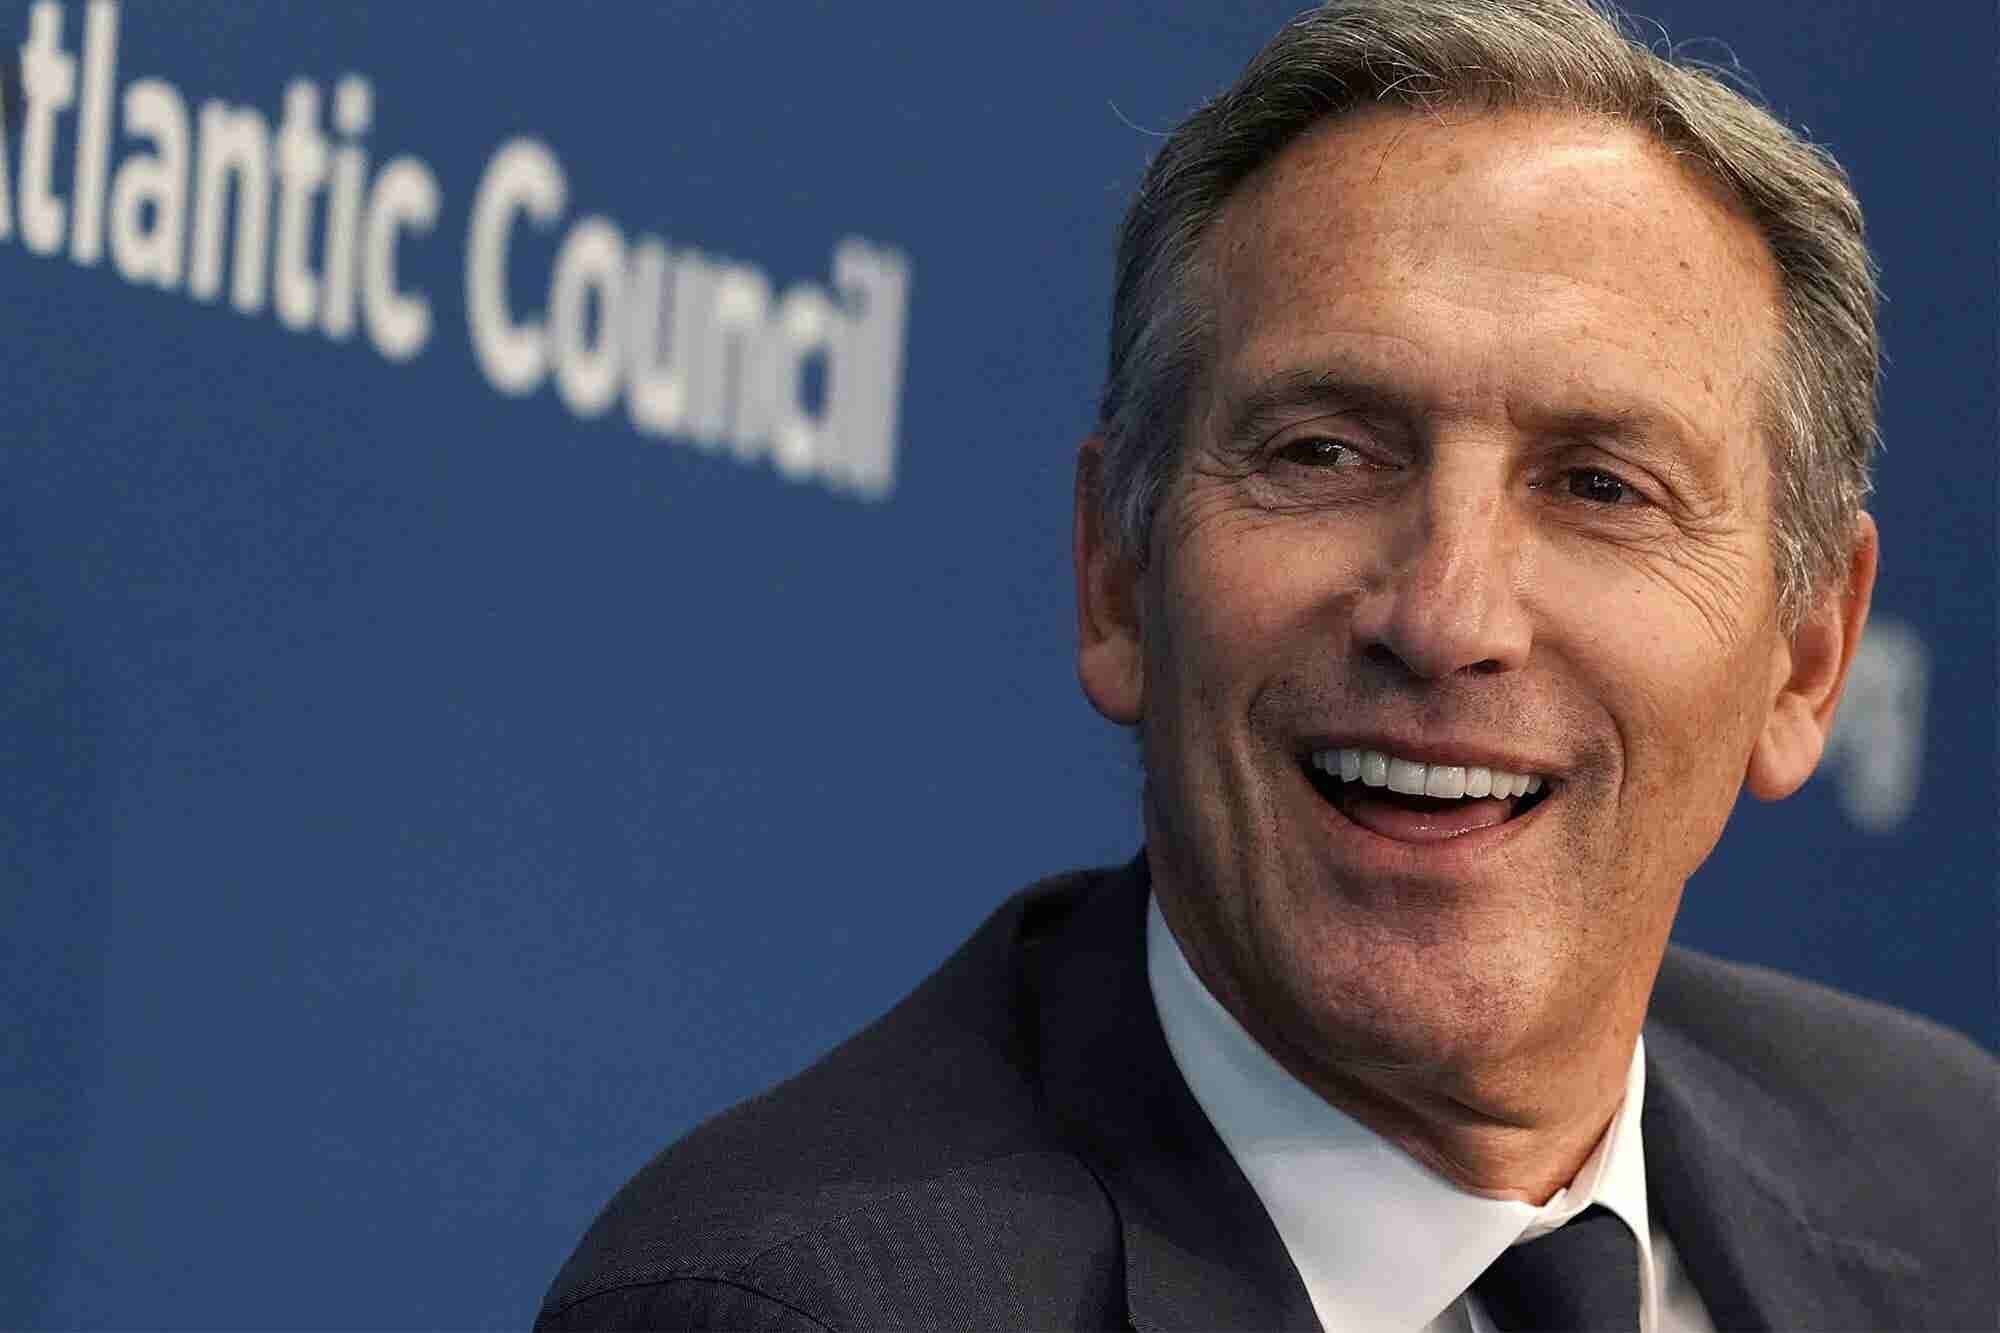 Former Starbucks CEO Howard Schultz Says He's Considering a 2020 Run '...